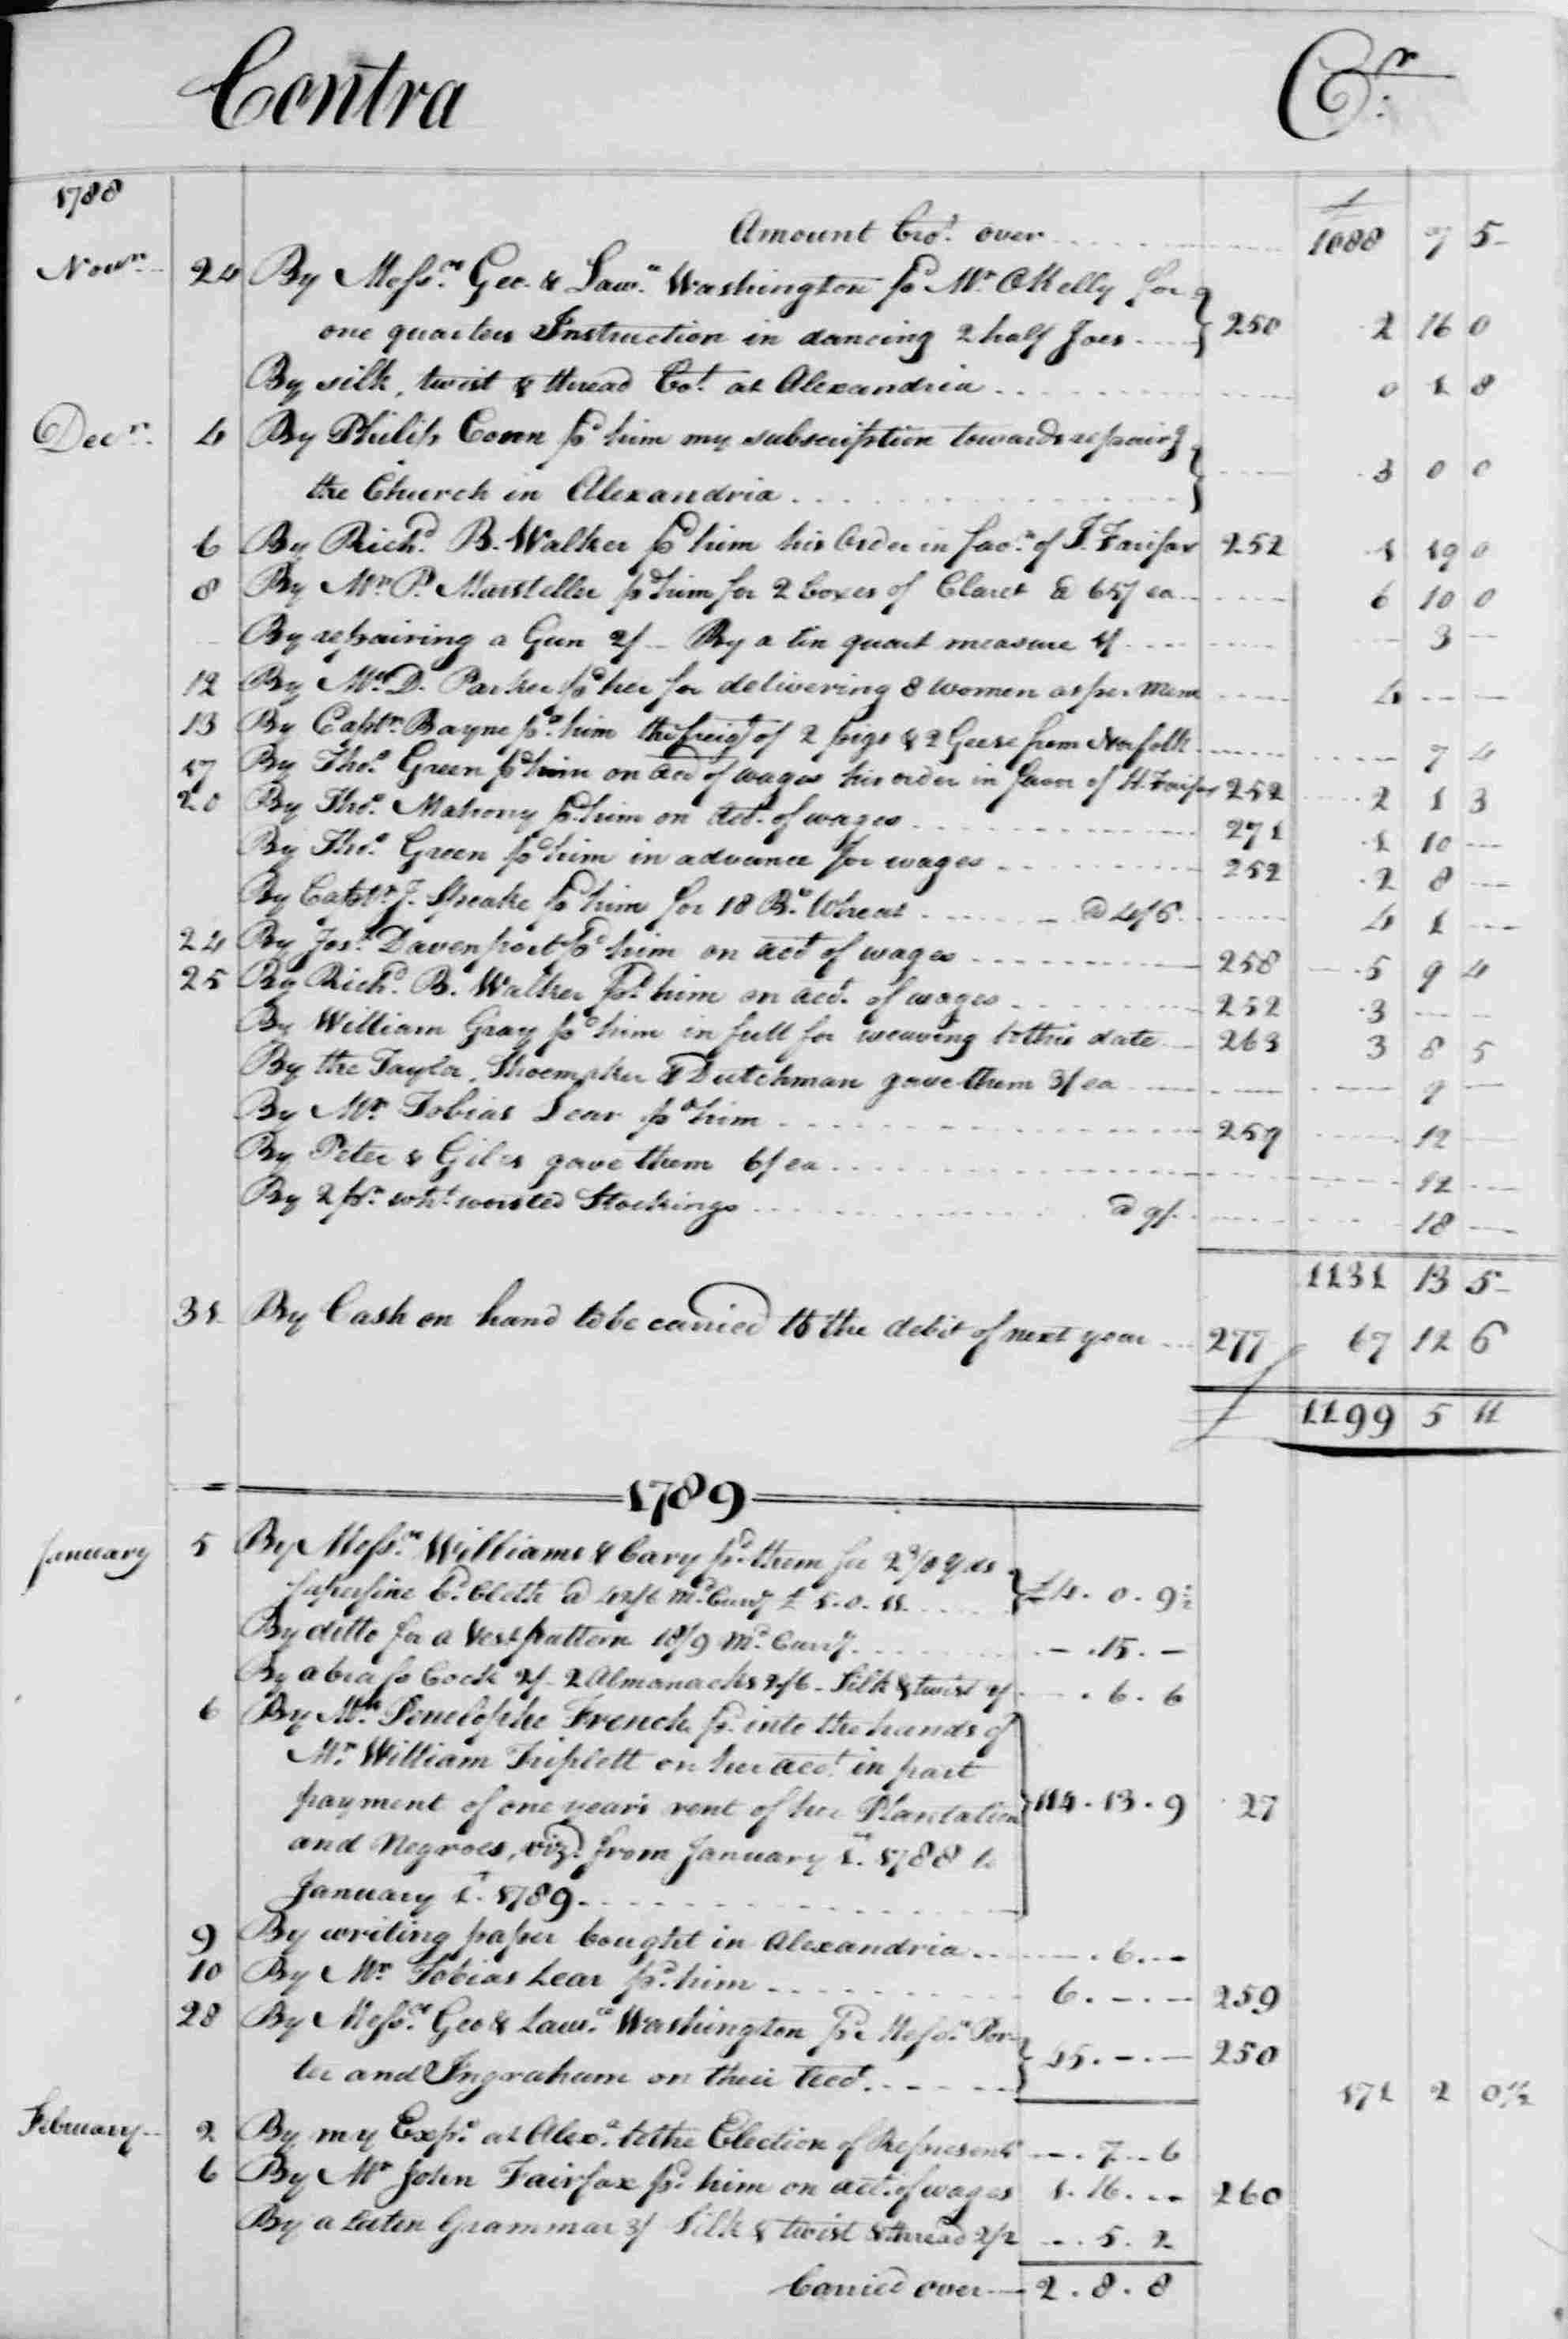 Ledger B, folio 276, right side